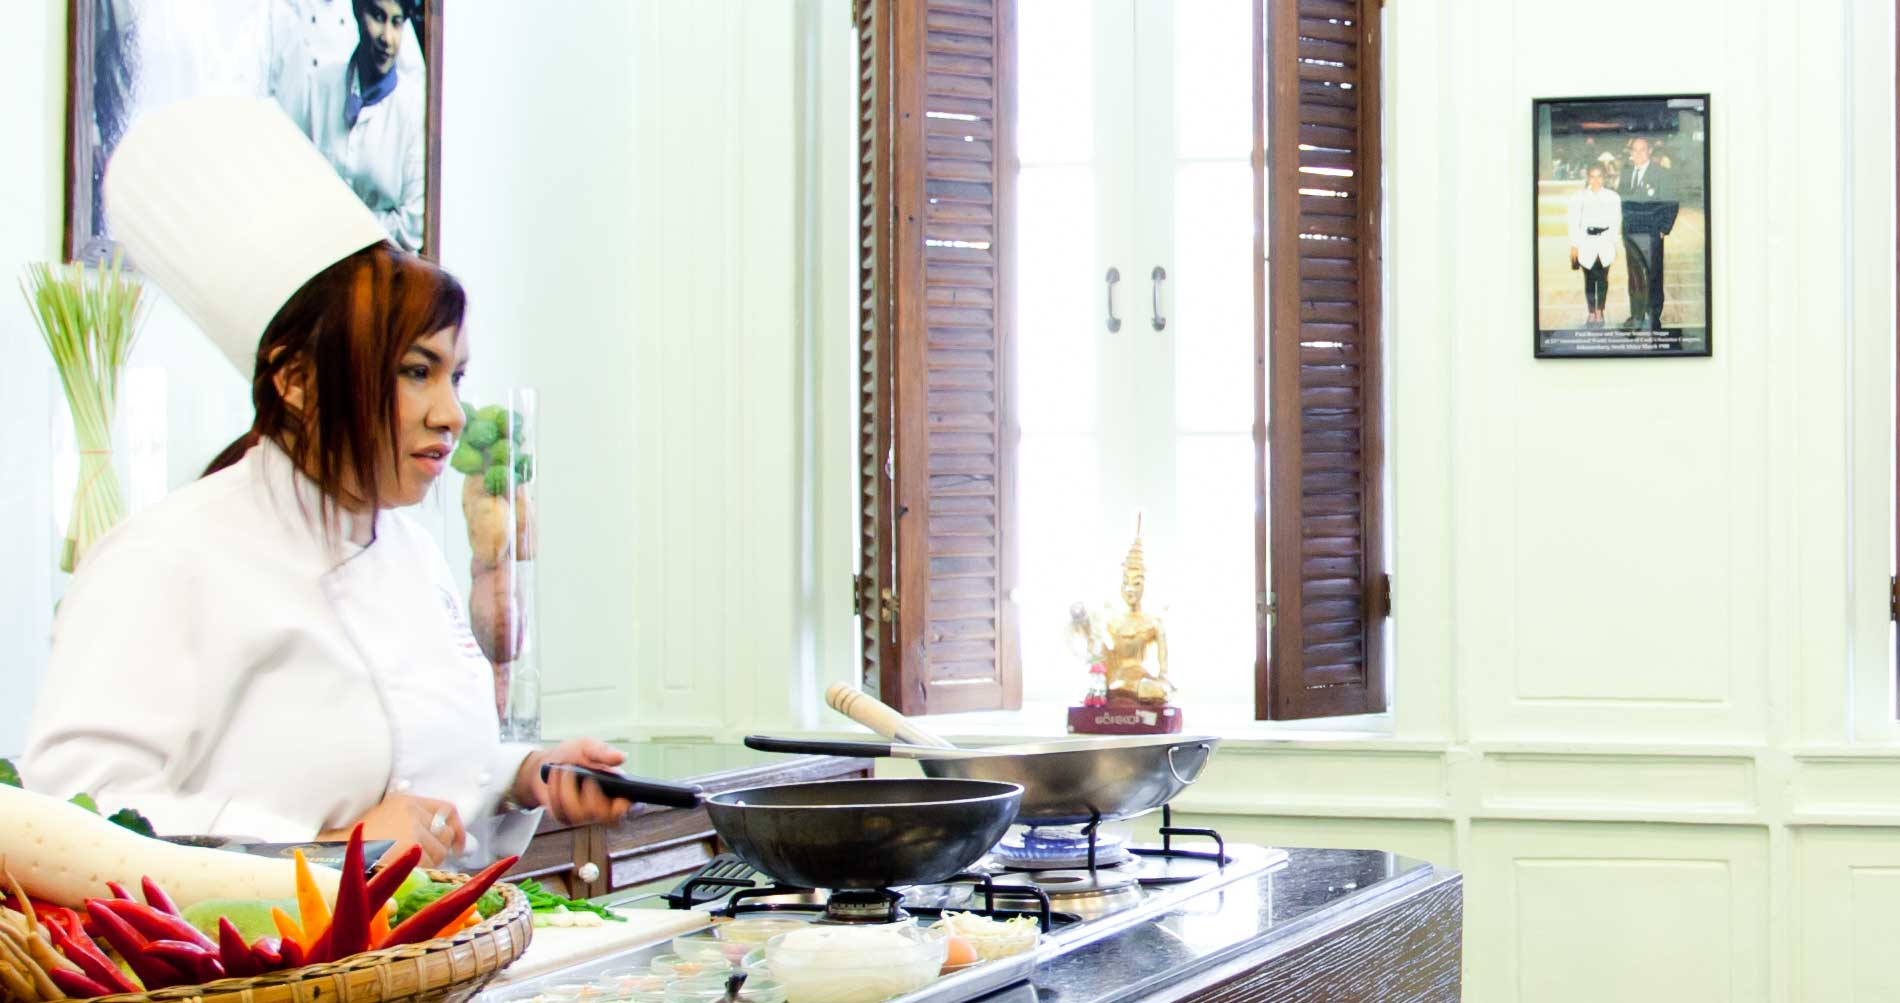 scuola-di-cucina-al-blue-elephant_14-5759632